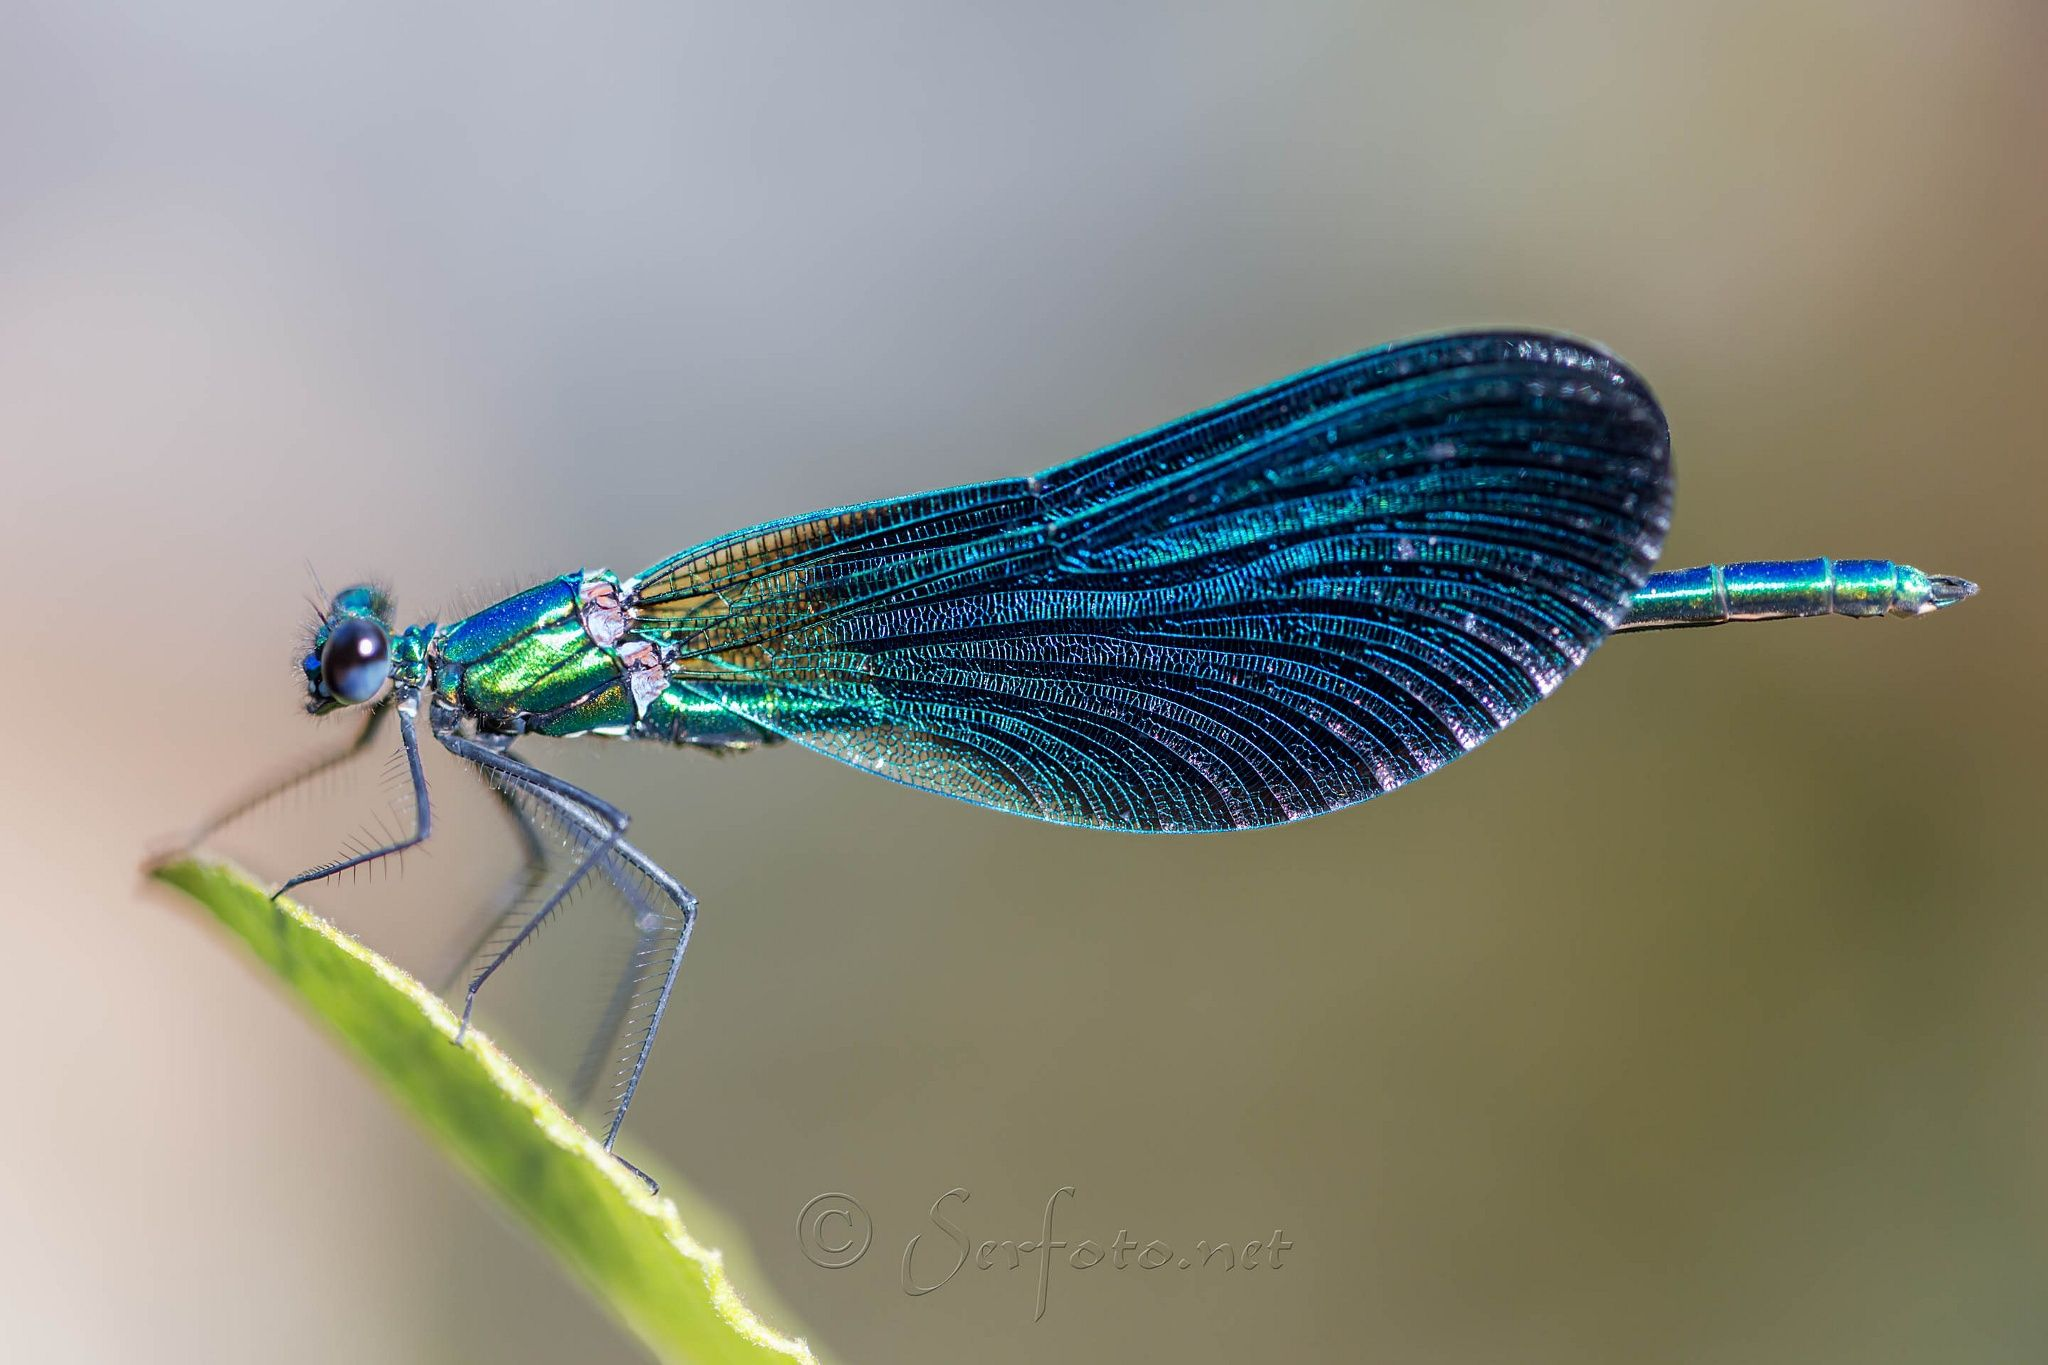 Wonderful colors and details!  Calopterix Virgo by Pablo Sandoval González on 500px